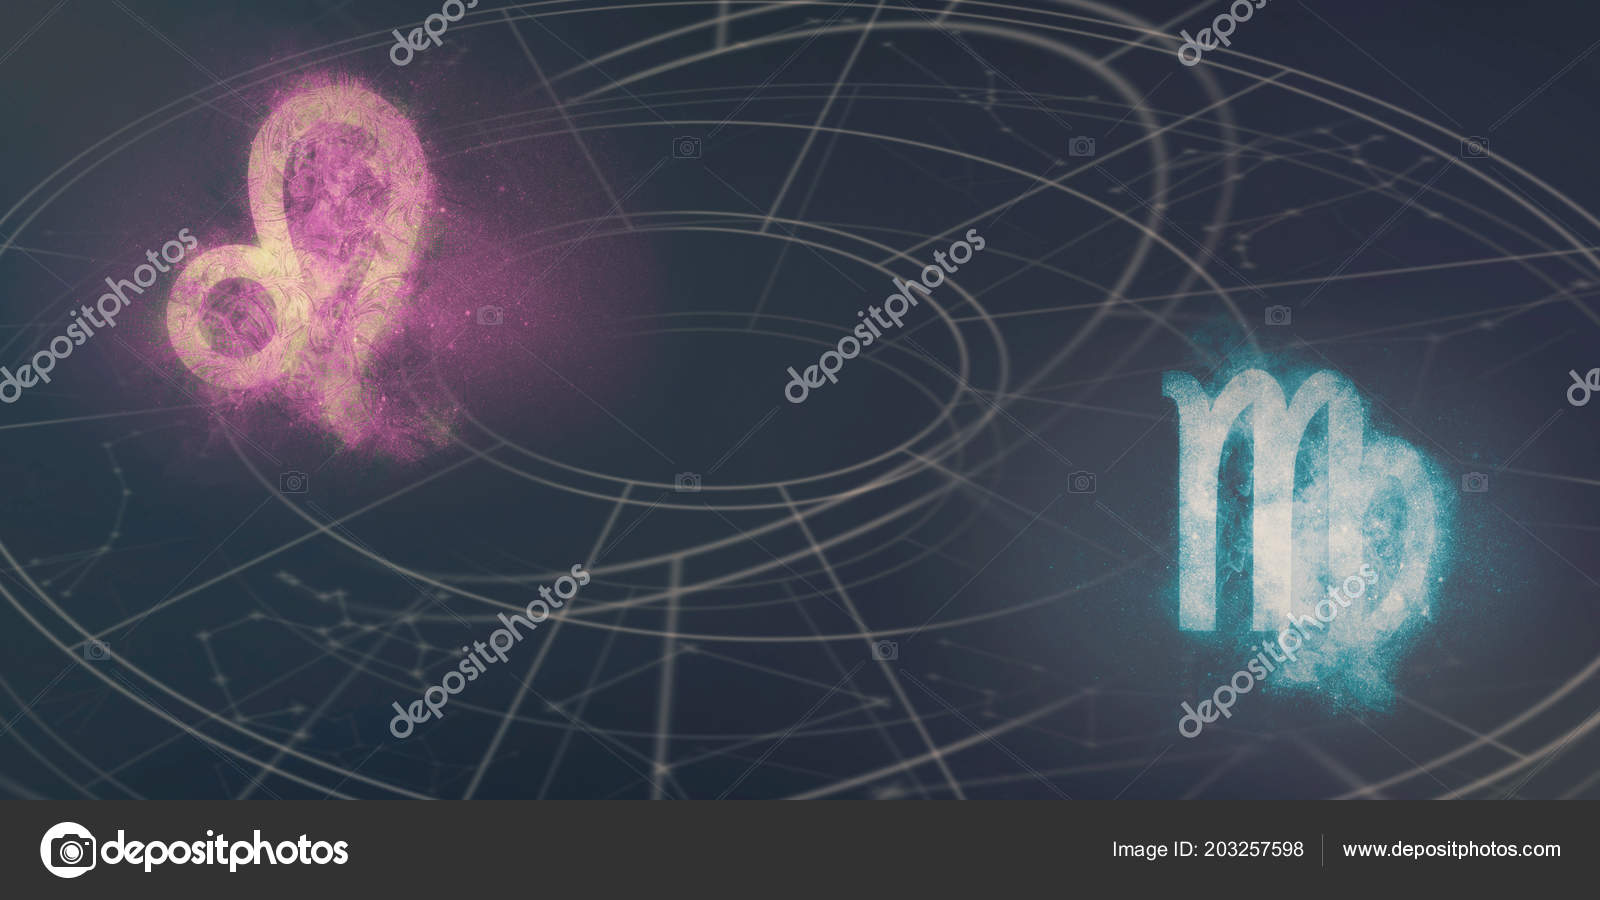 Wallpapers Leo Leo Virgo Horoscope Signs Compatibility